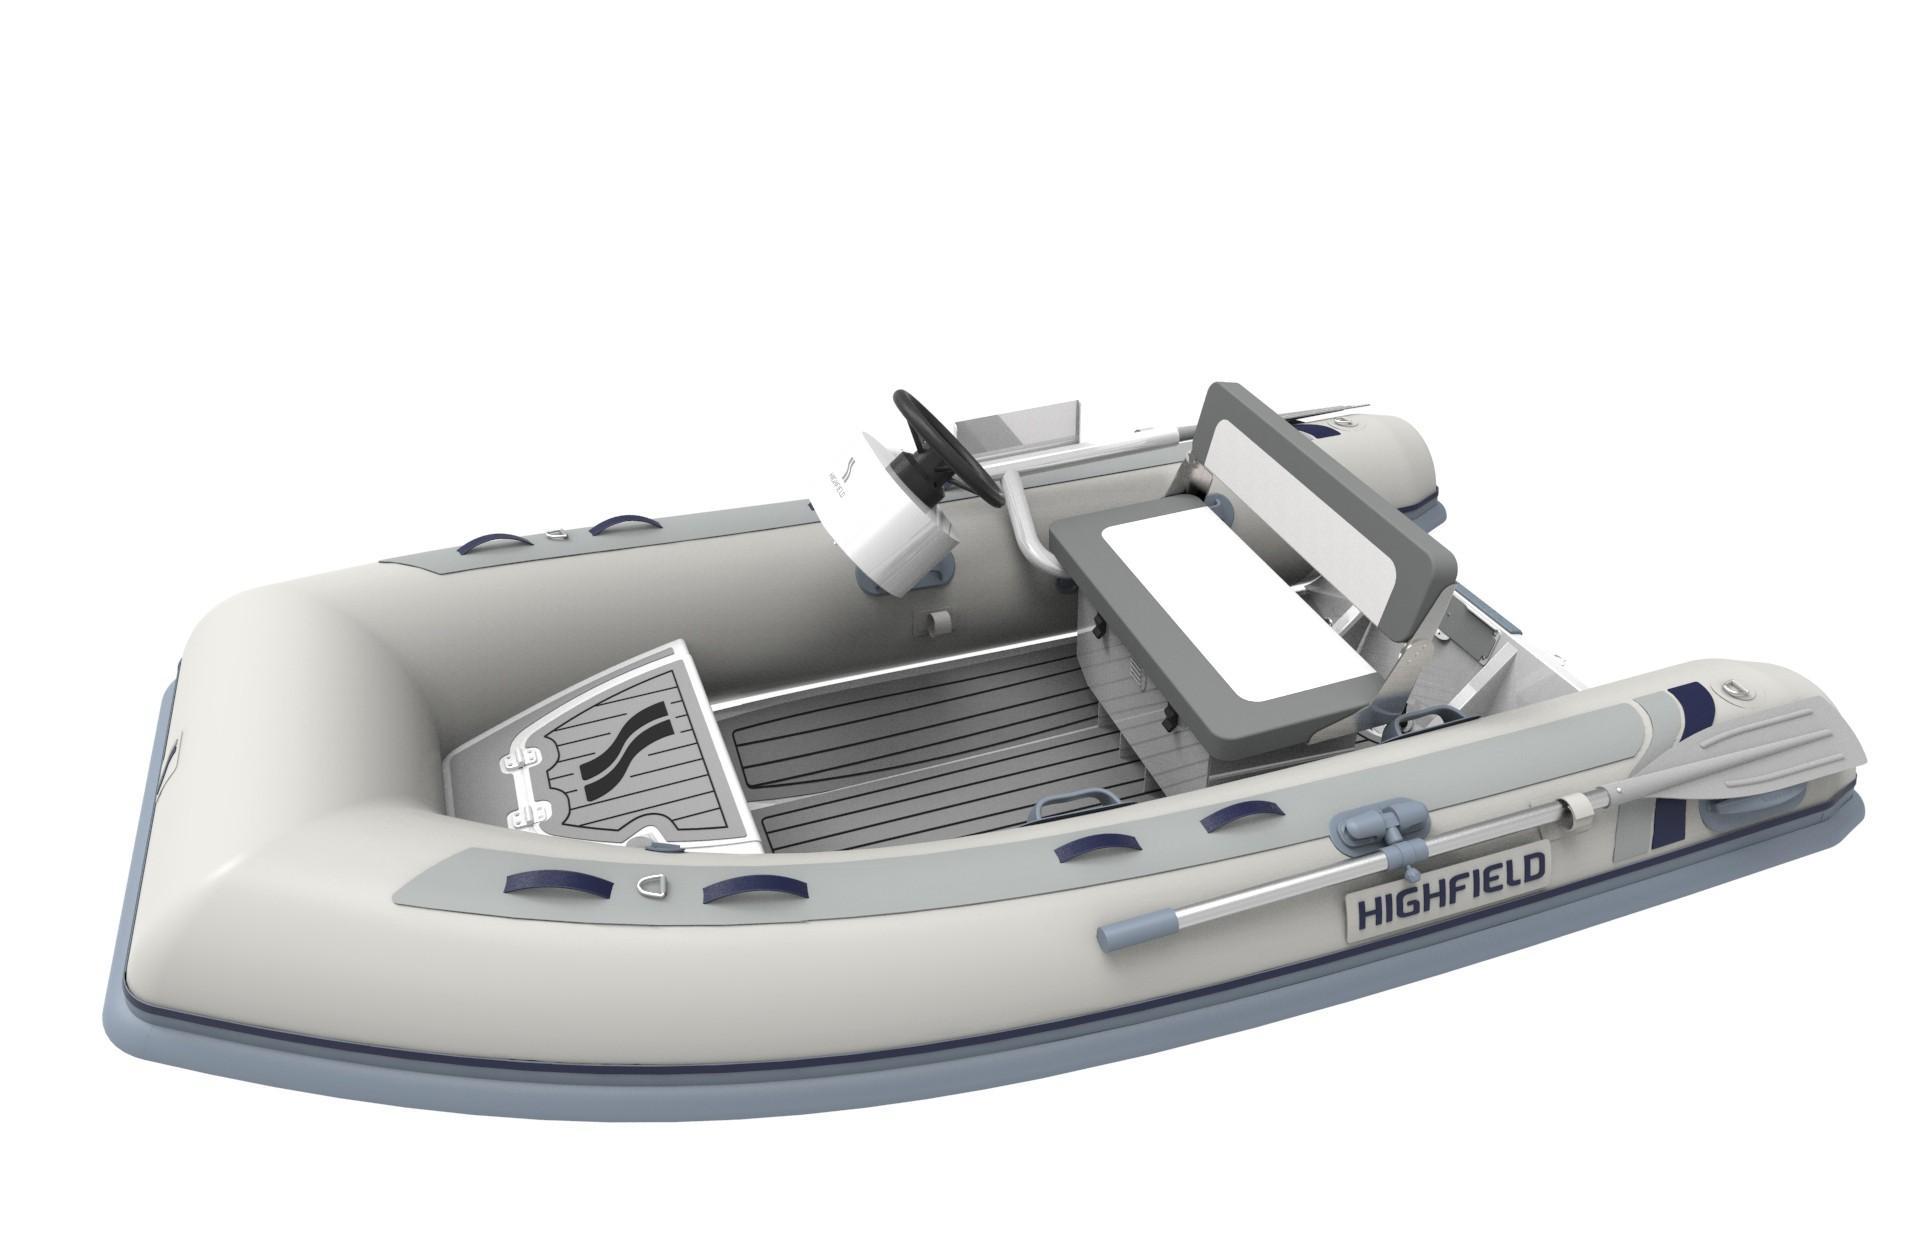 Highfield Boat image